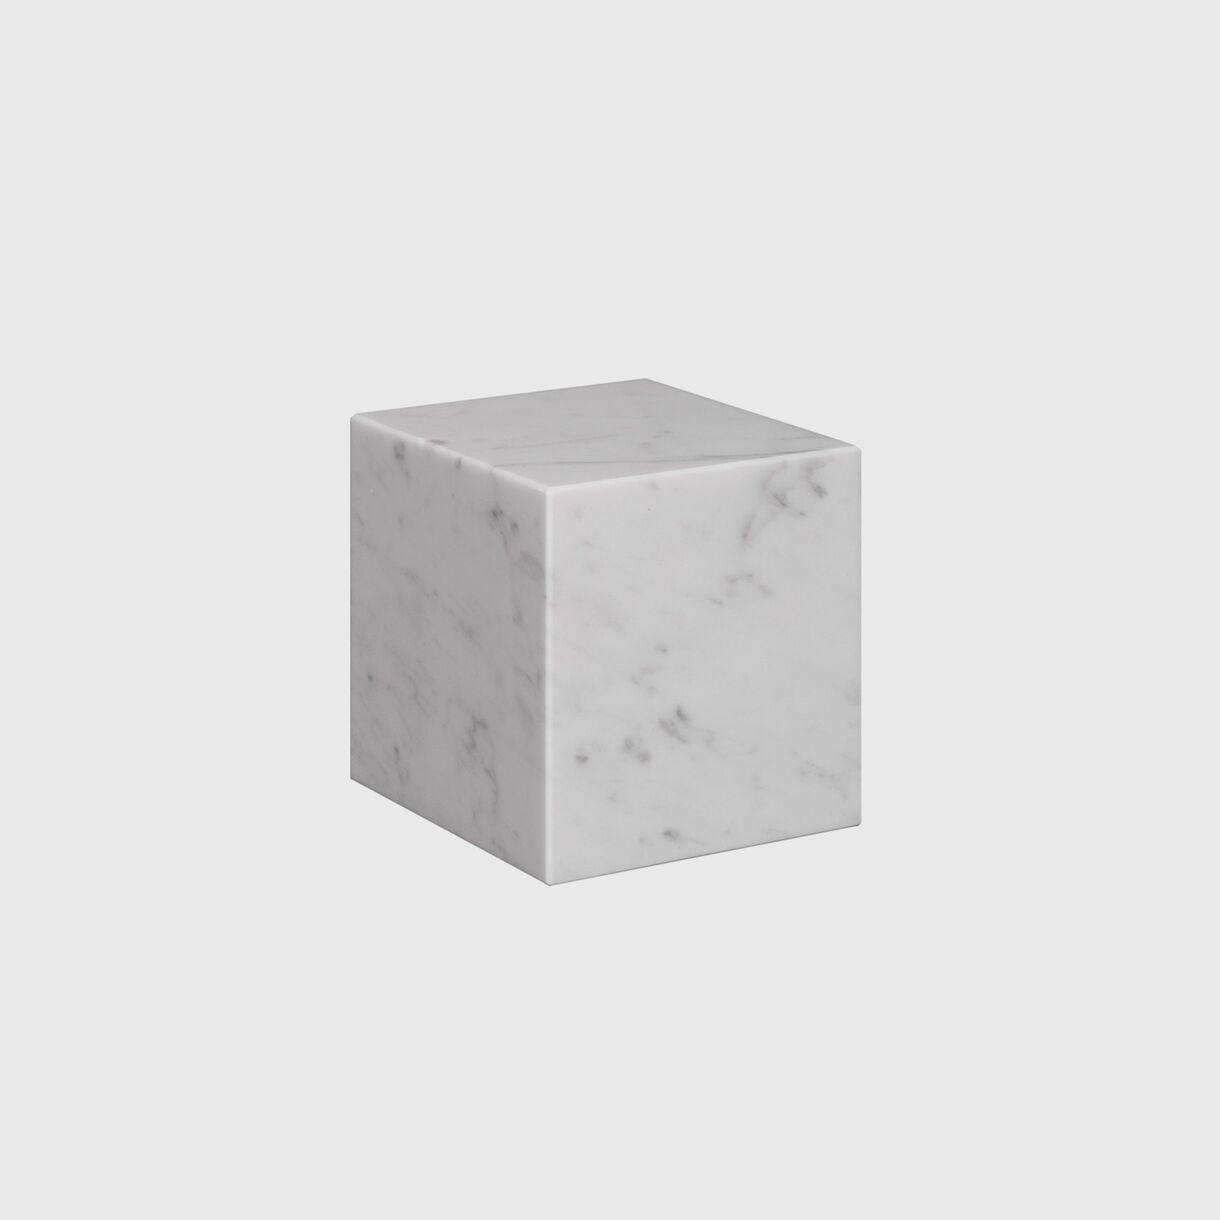 Stop Bookend, White Carrara Marble, Small